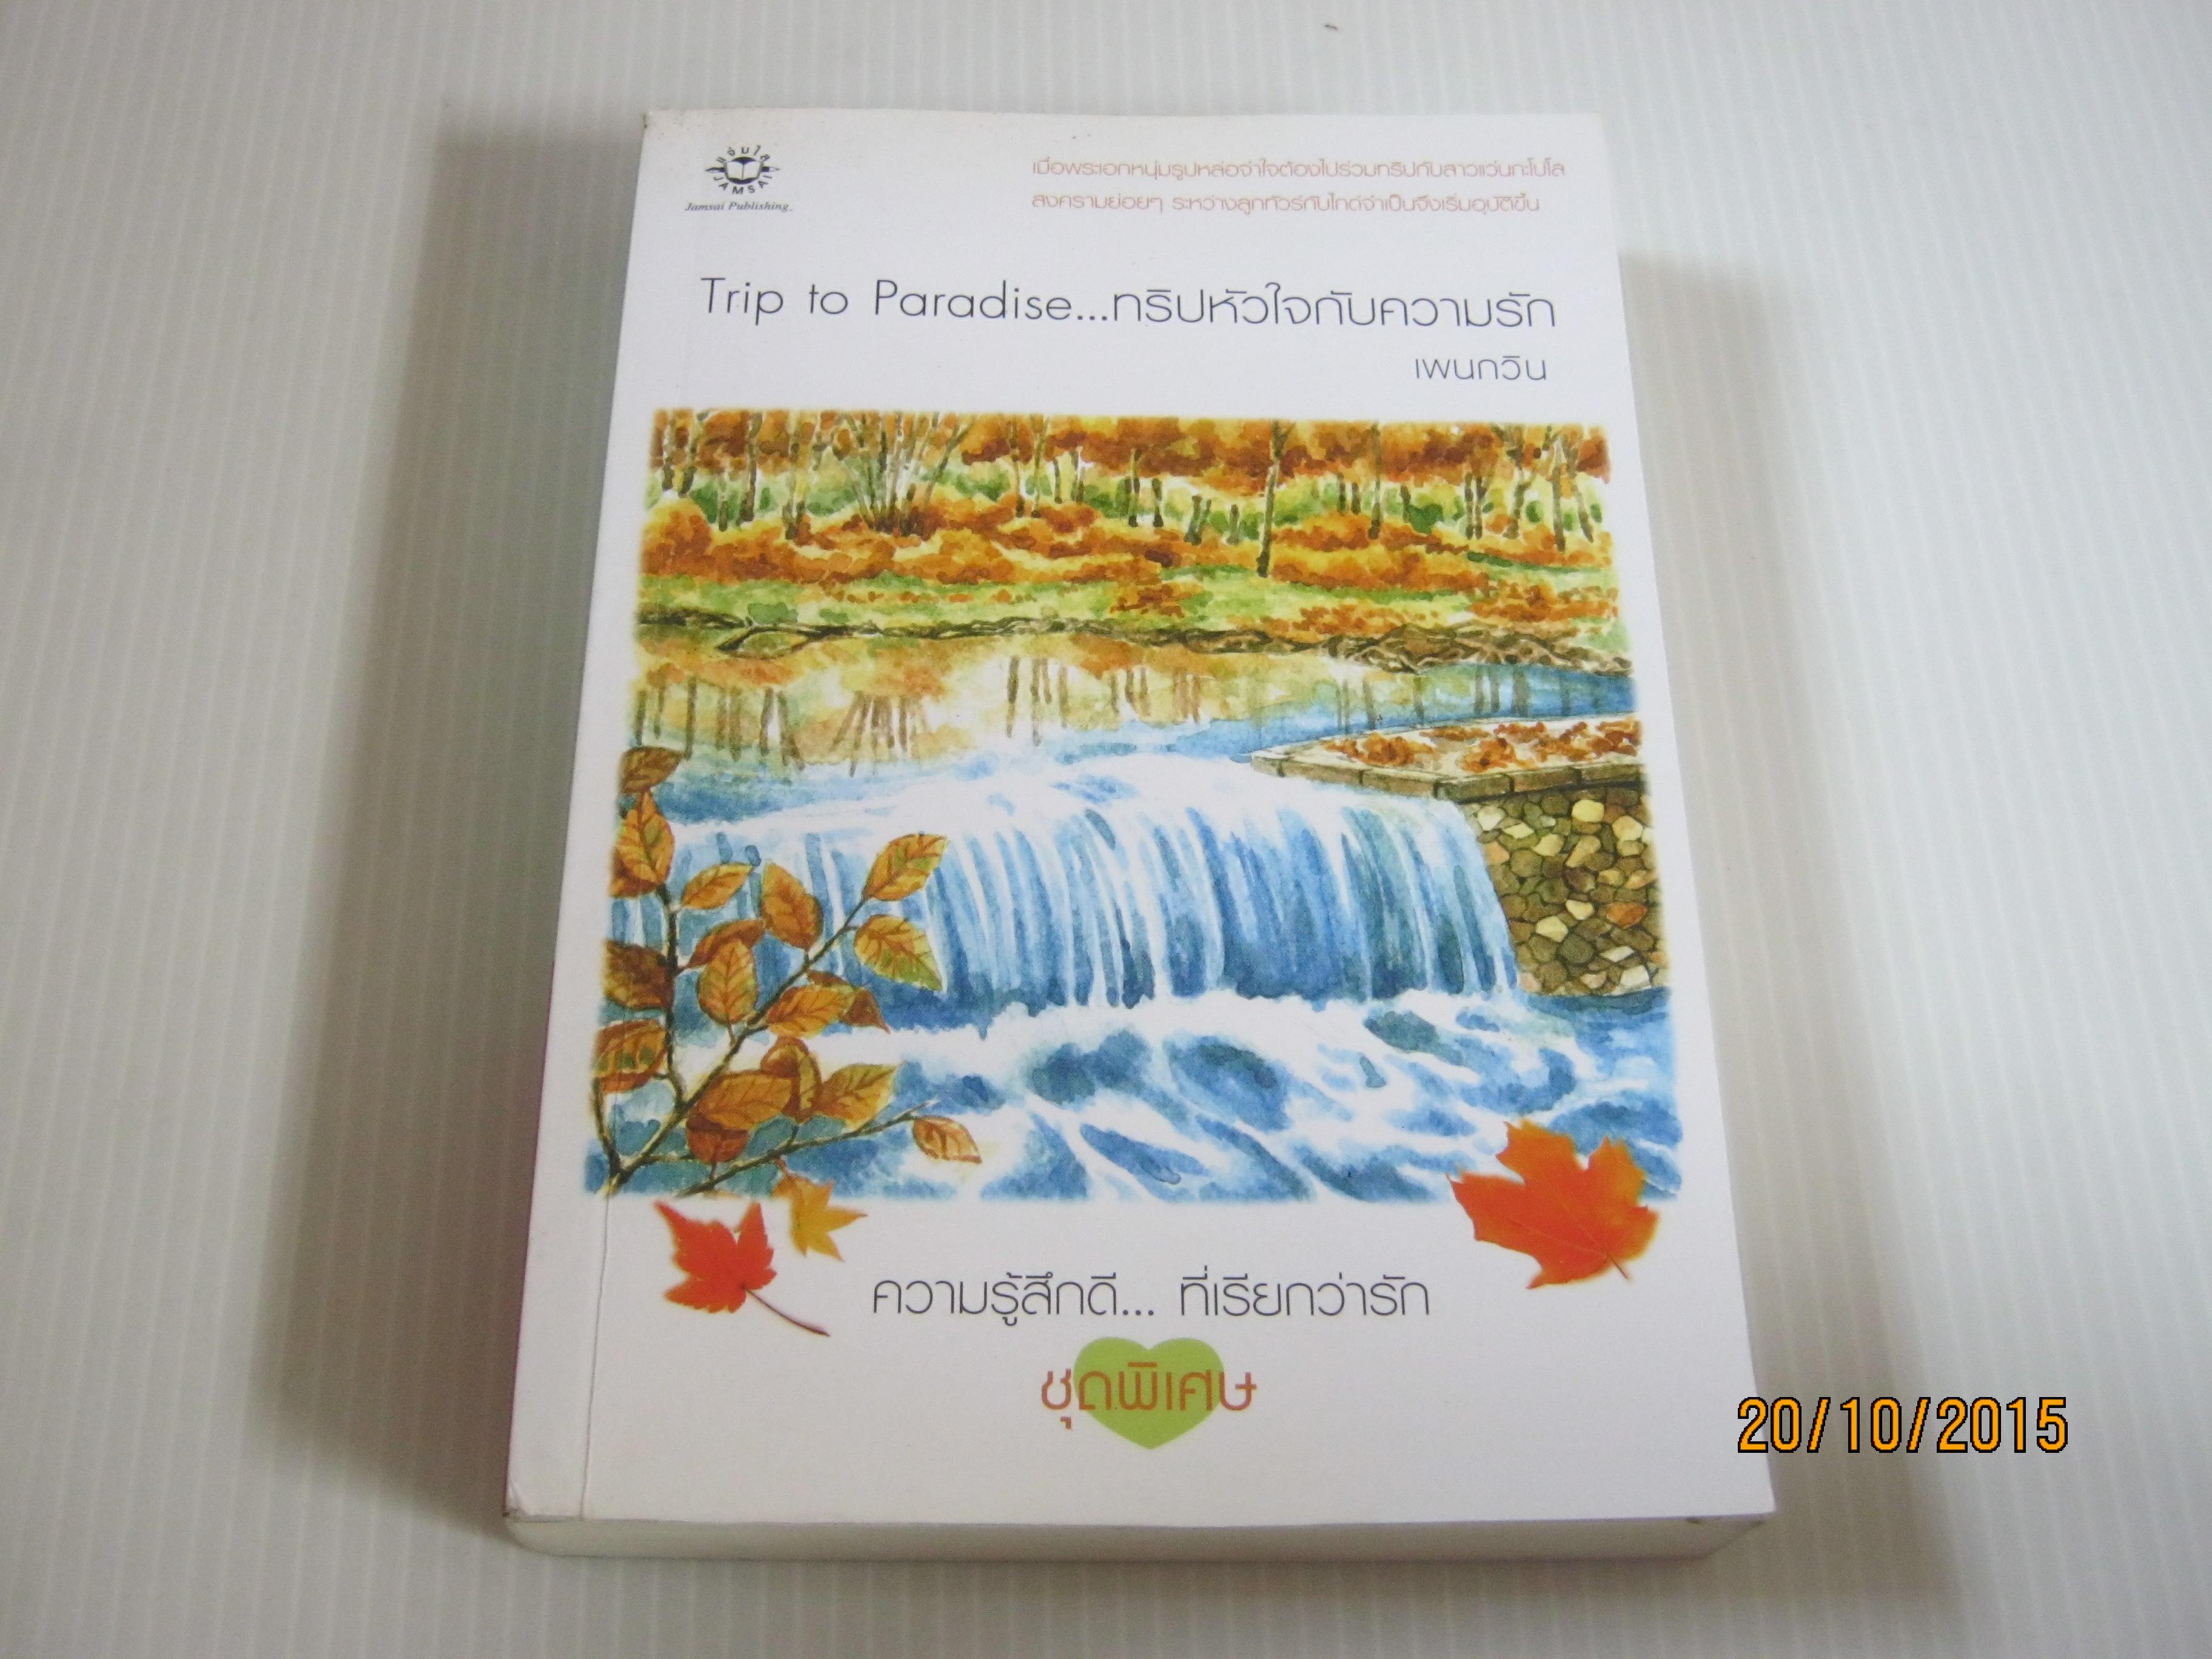 Trip to Paradise...ทริปหัวใจกับความรัก เพนกวิน เขียน